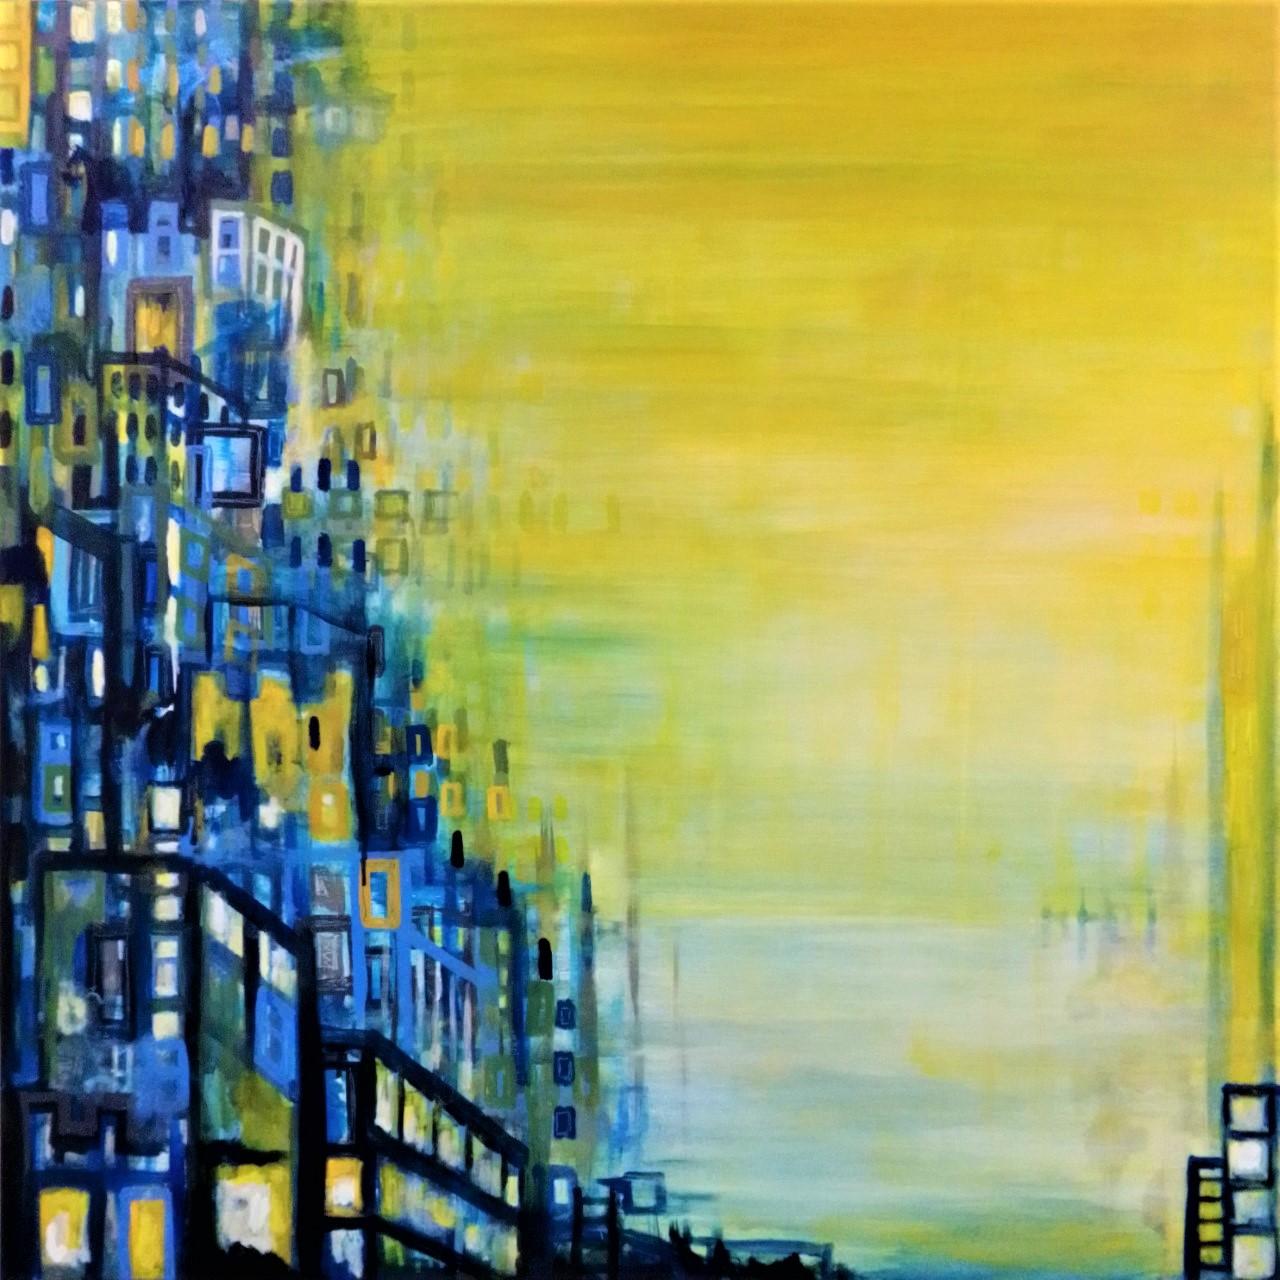 new year l-tuziam schilderij painting artist urban landscape